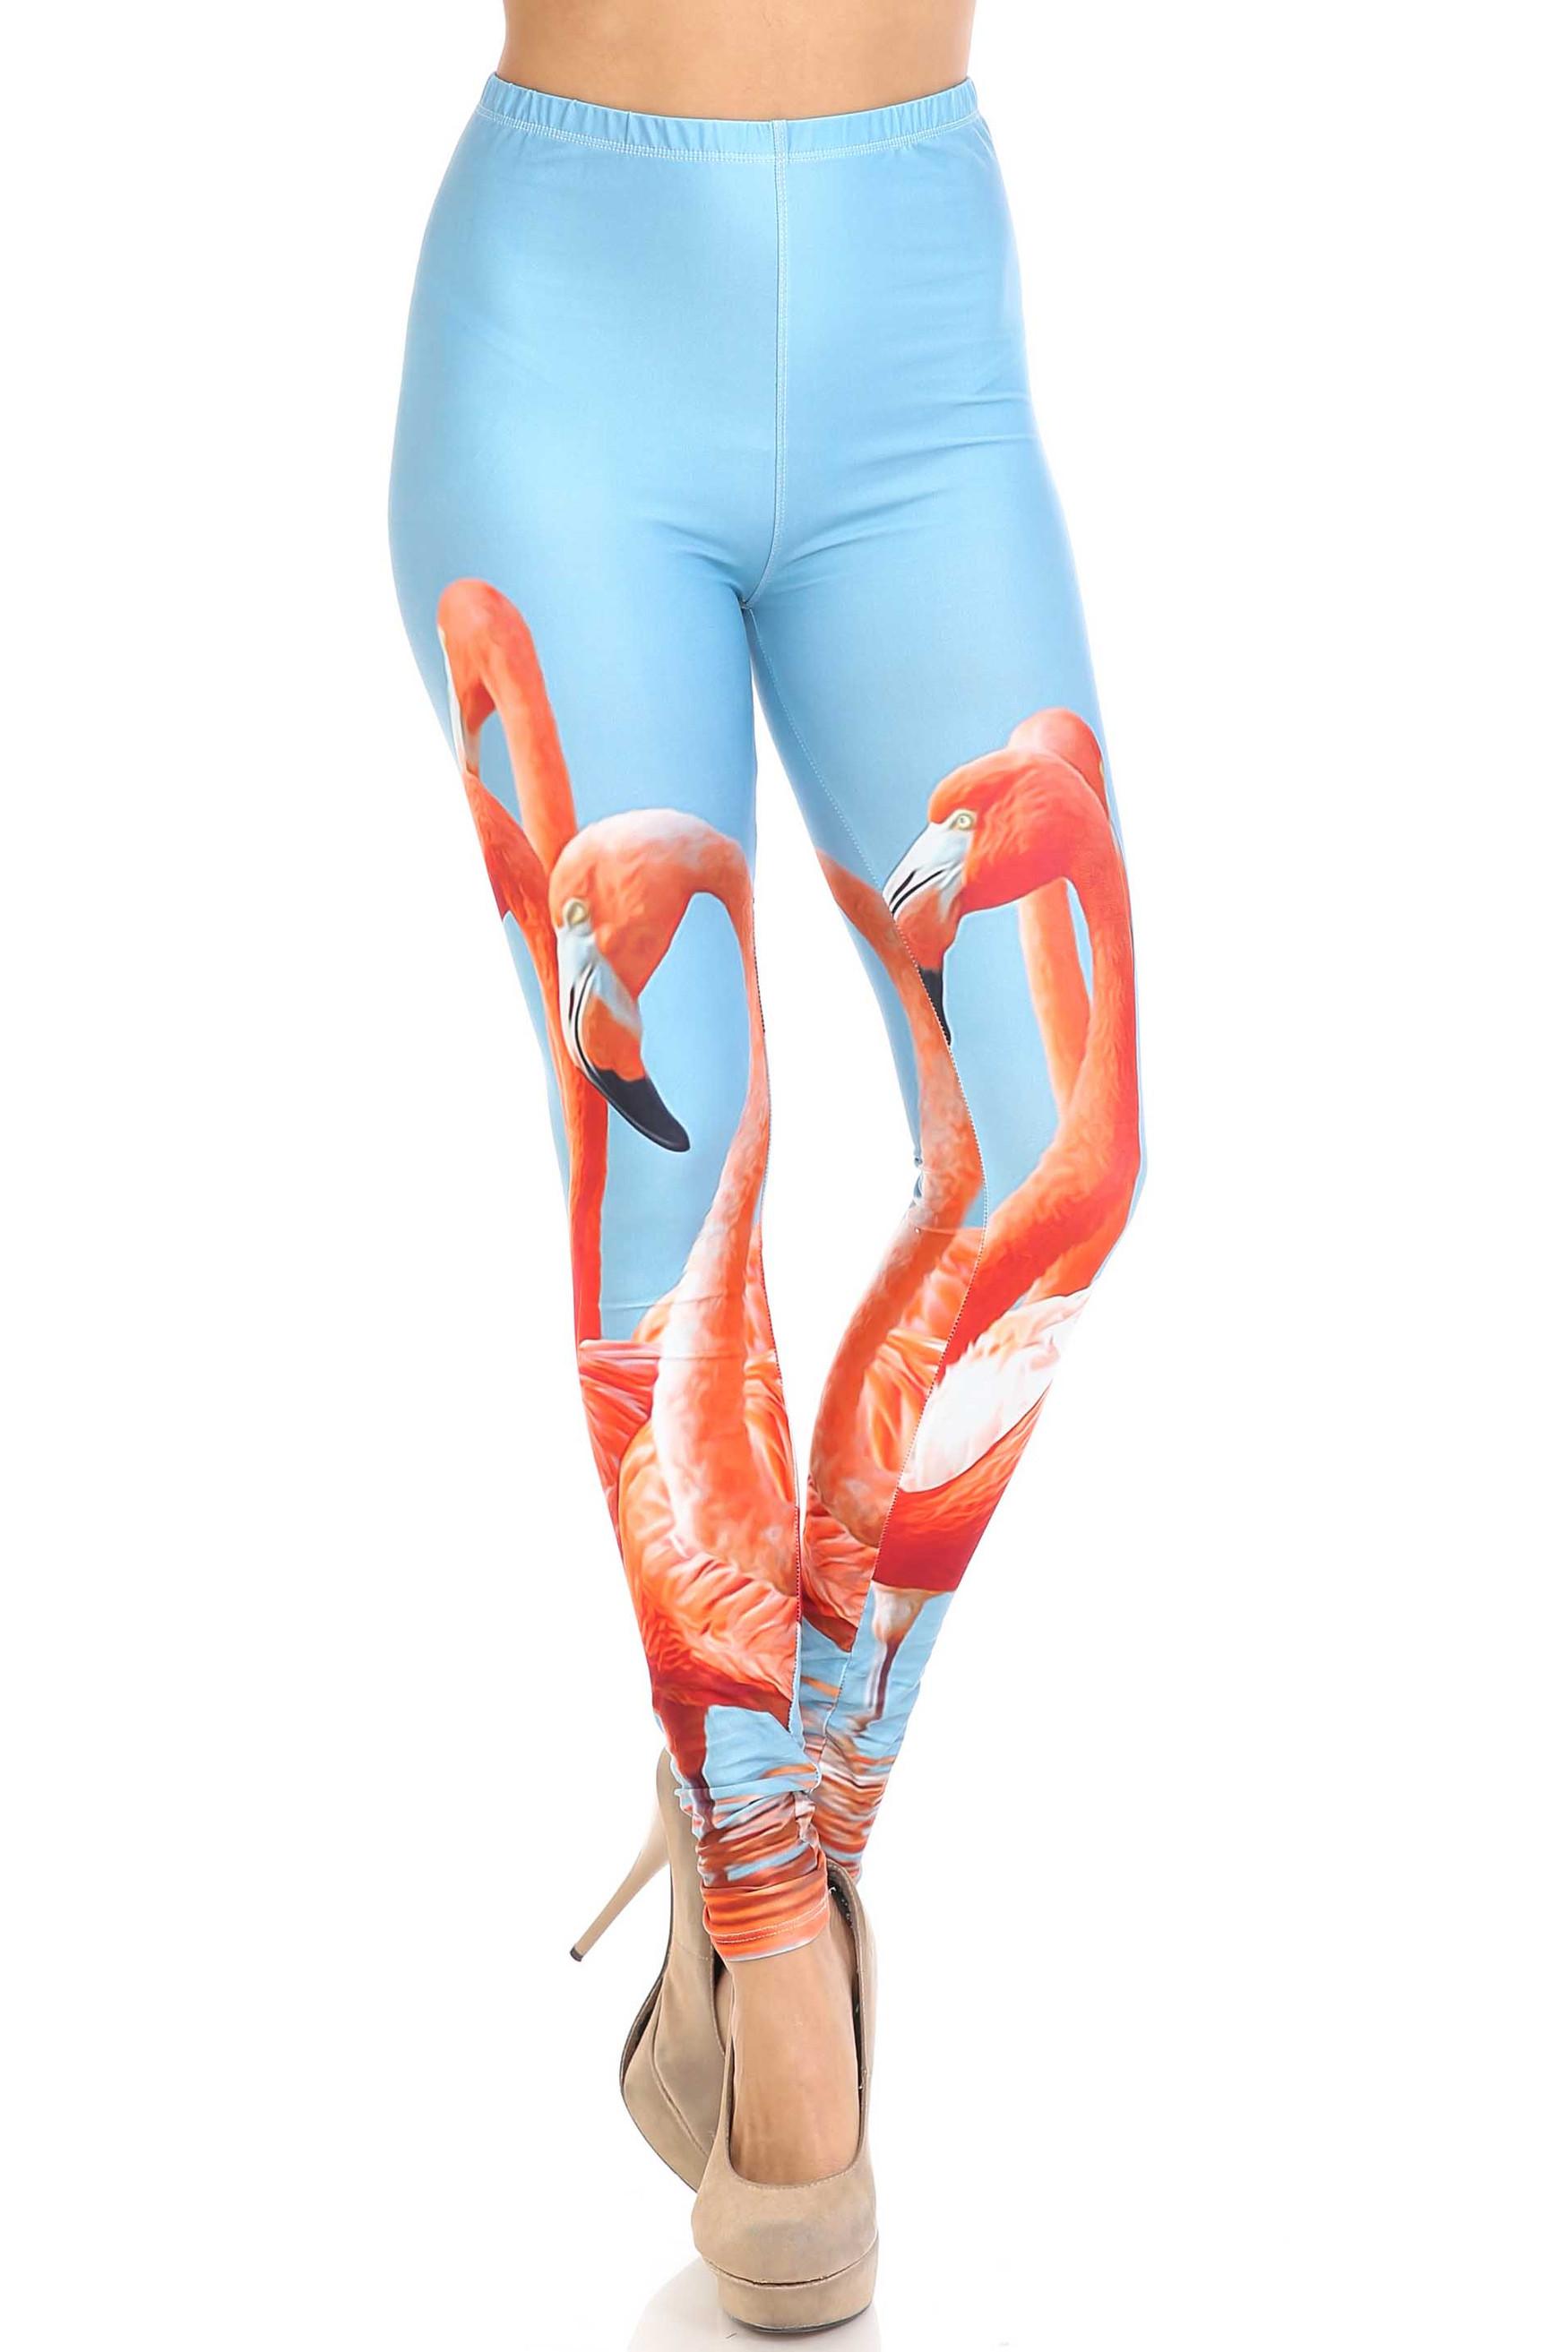 Creamy Soft Flamingo Plus Size Leggings - USA Fashion™